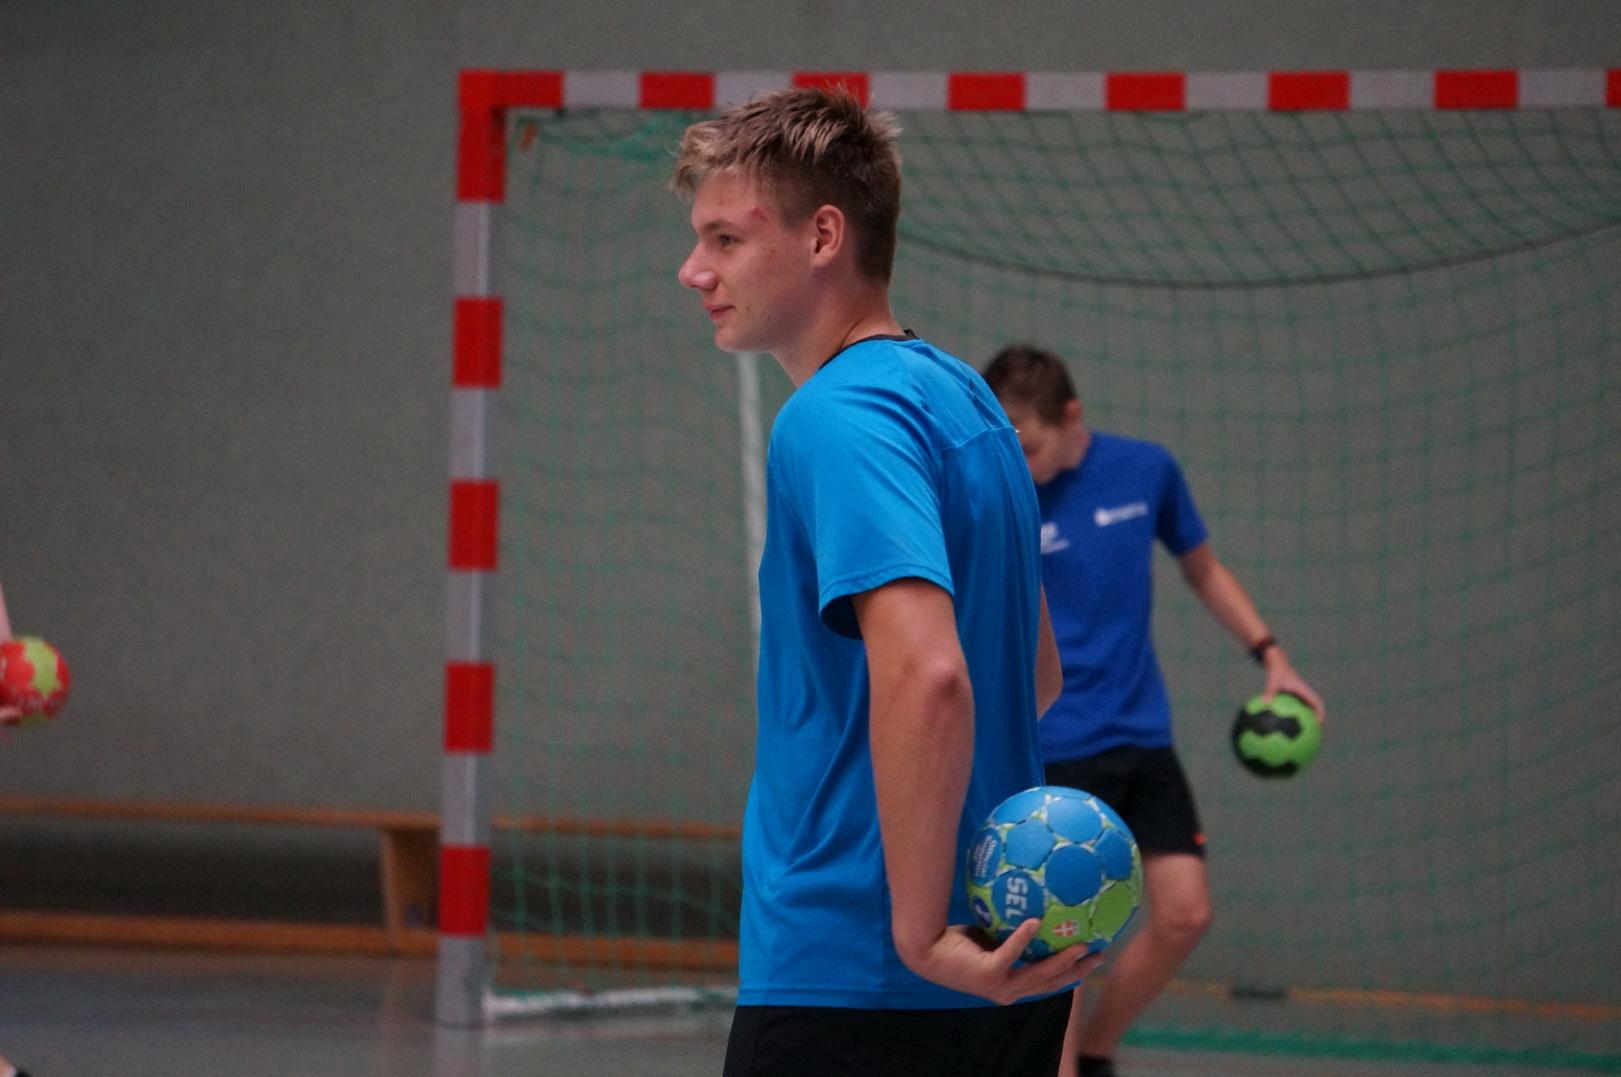 201808_Handballcamp_SDH_MG_149w